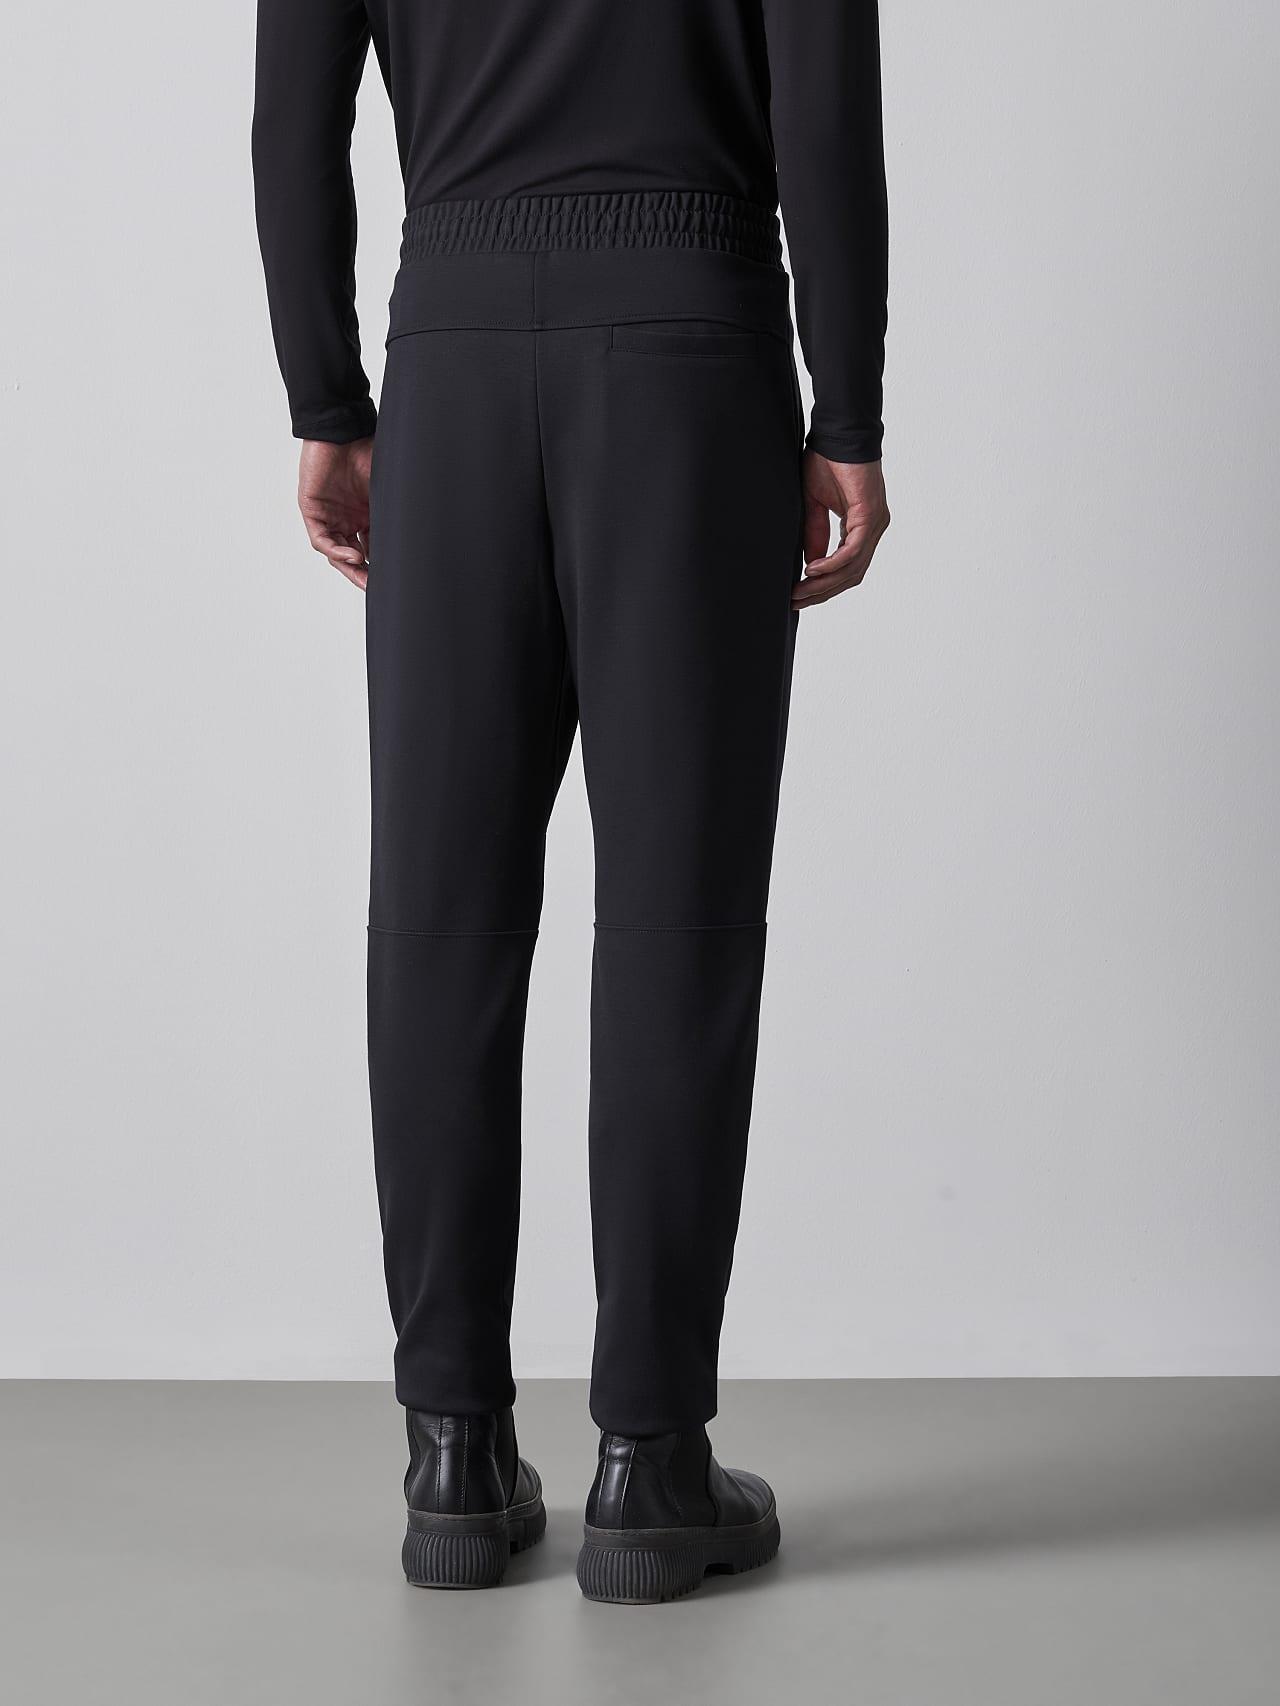 PRYK V7.Y5.02 Premium Sweatpants black Front Main Alpha Tauri